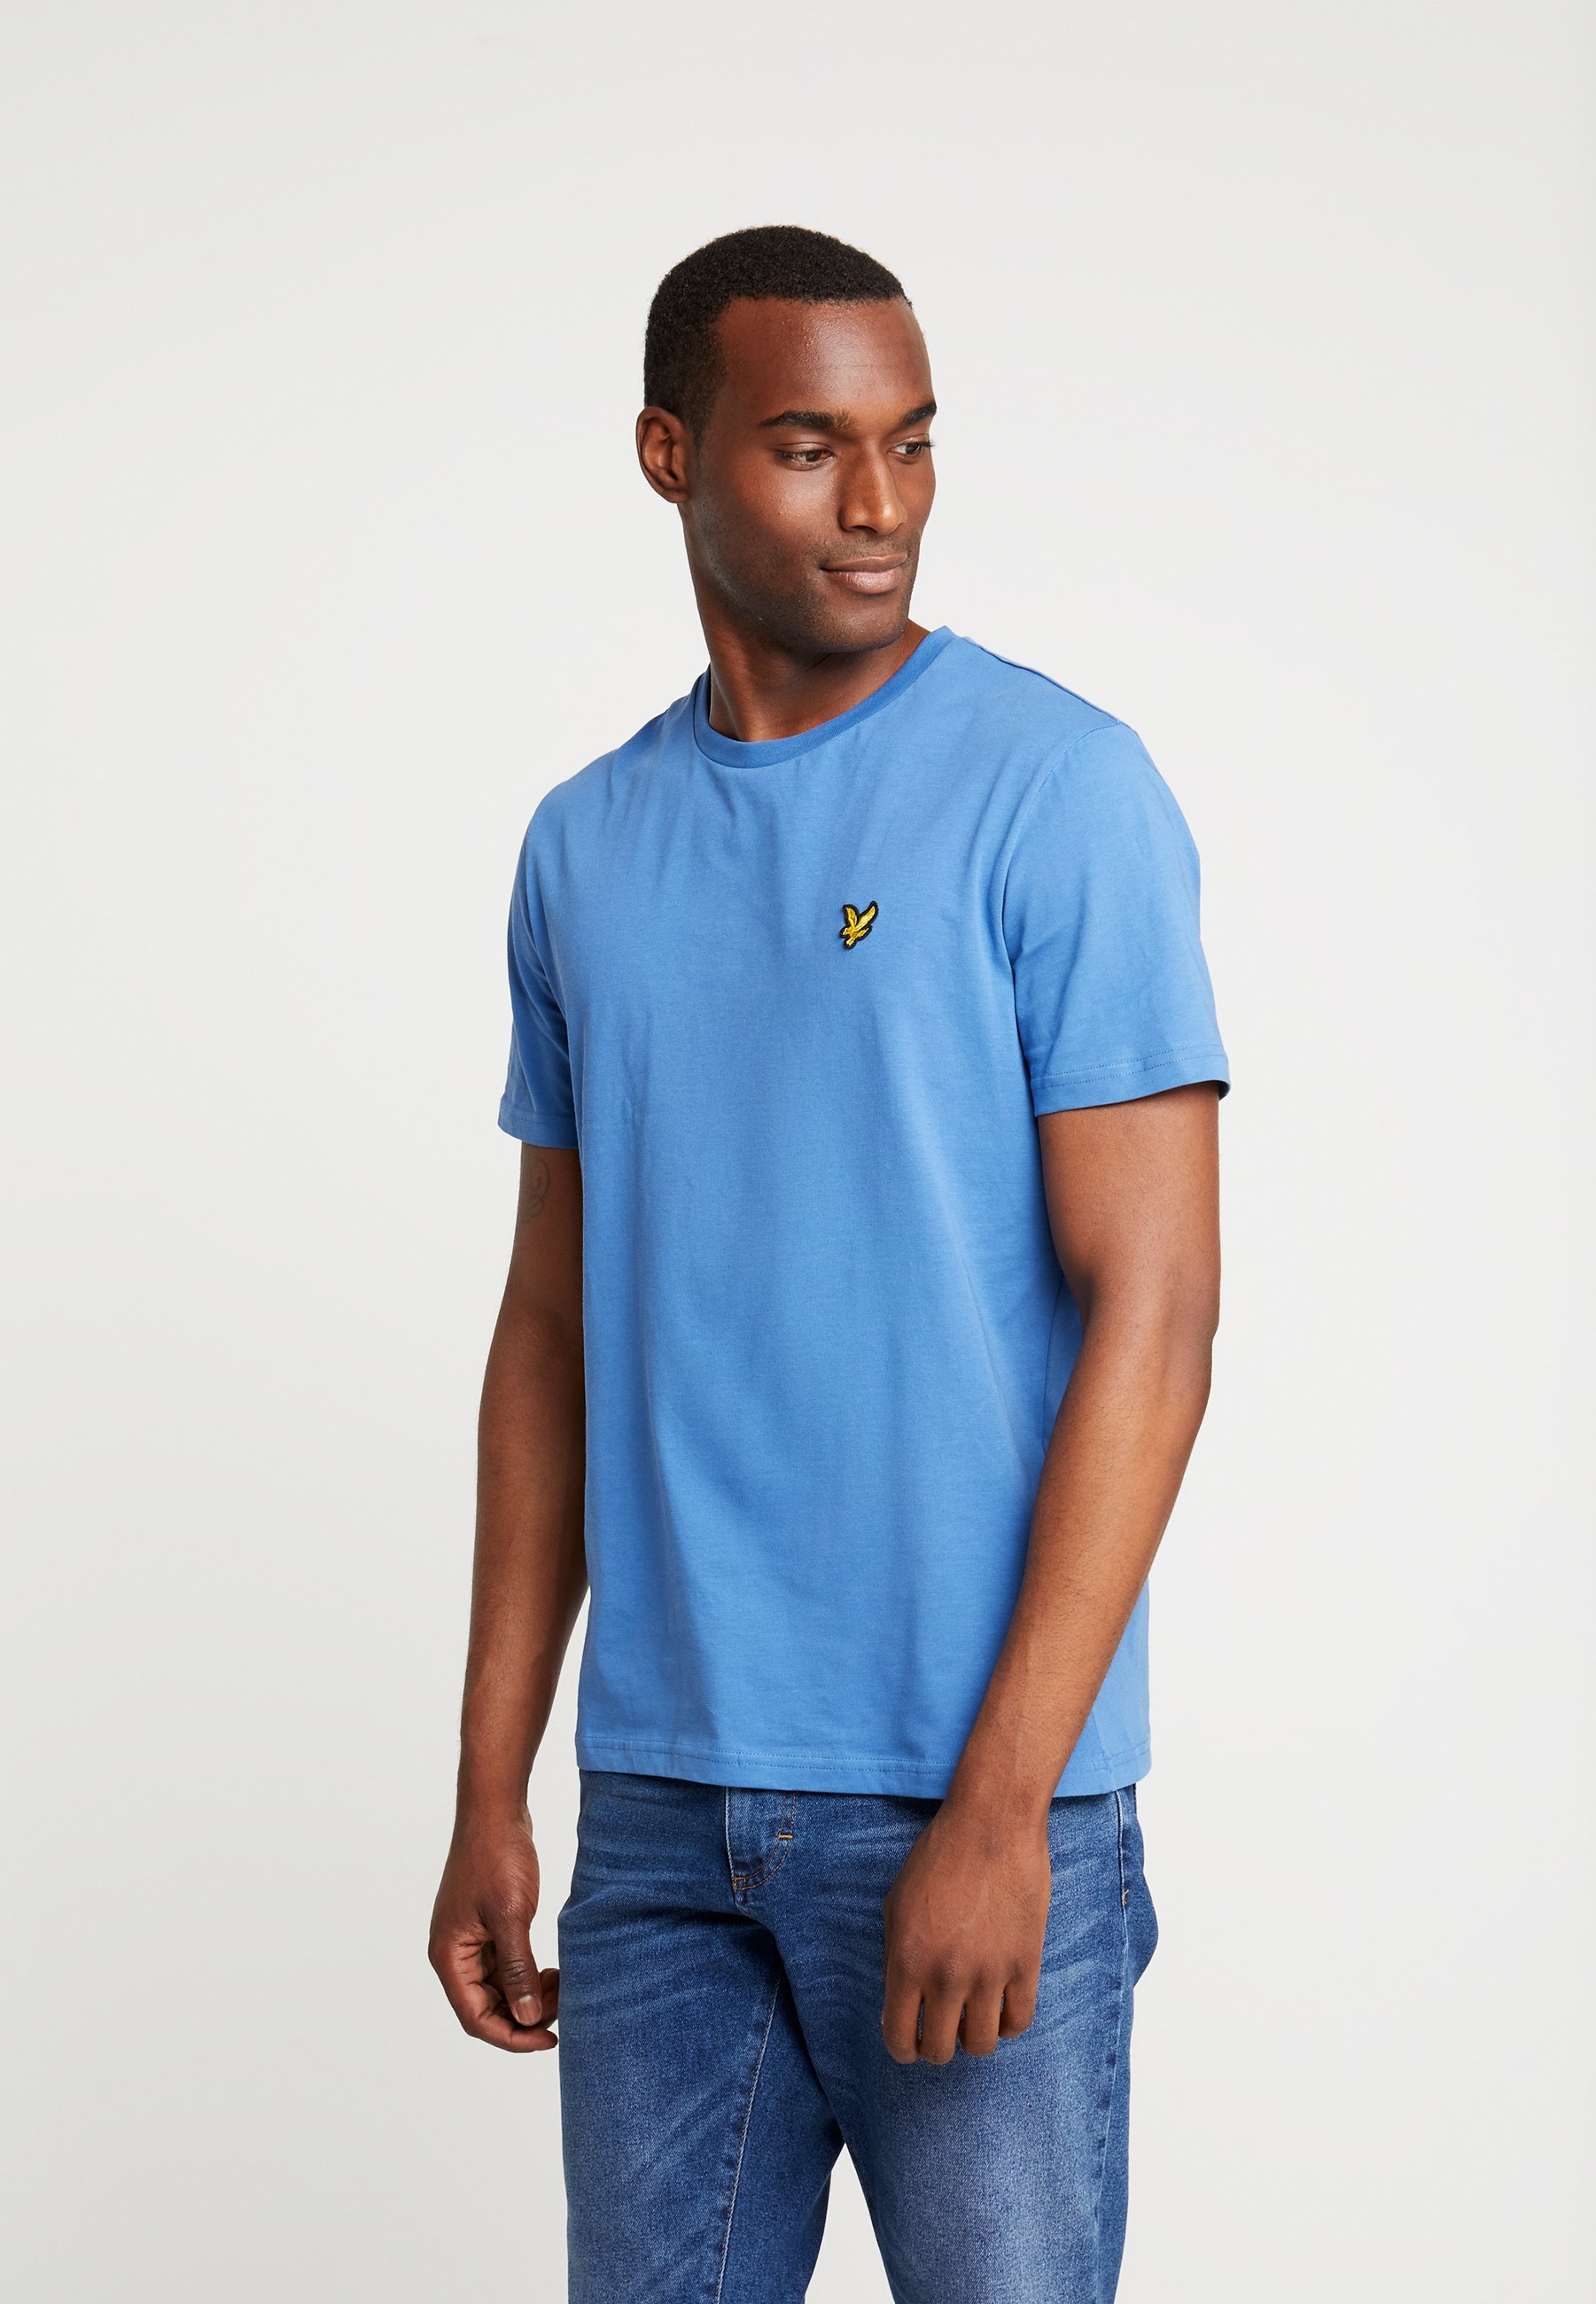 Lapis shirt Scott Crew Basique Blue Lyleamp; NeckT ulFcT31JK